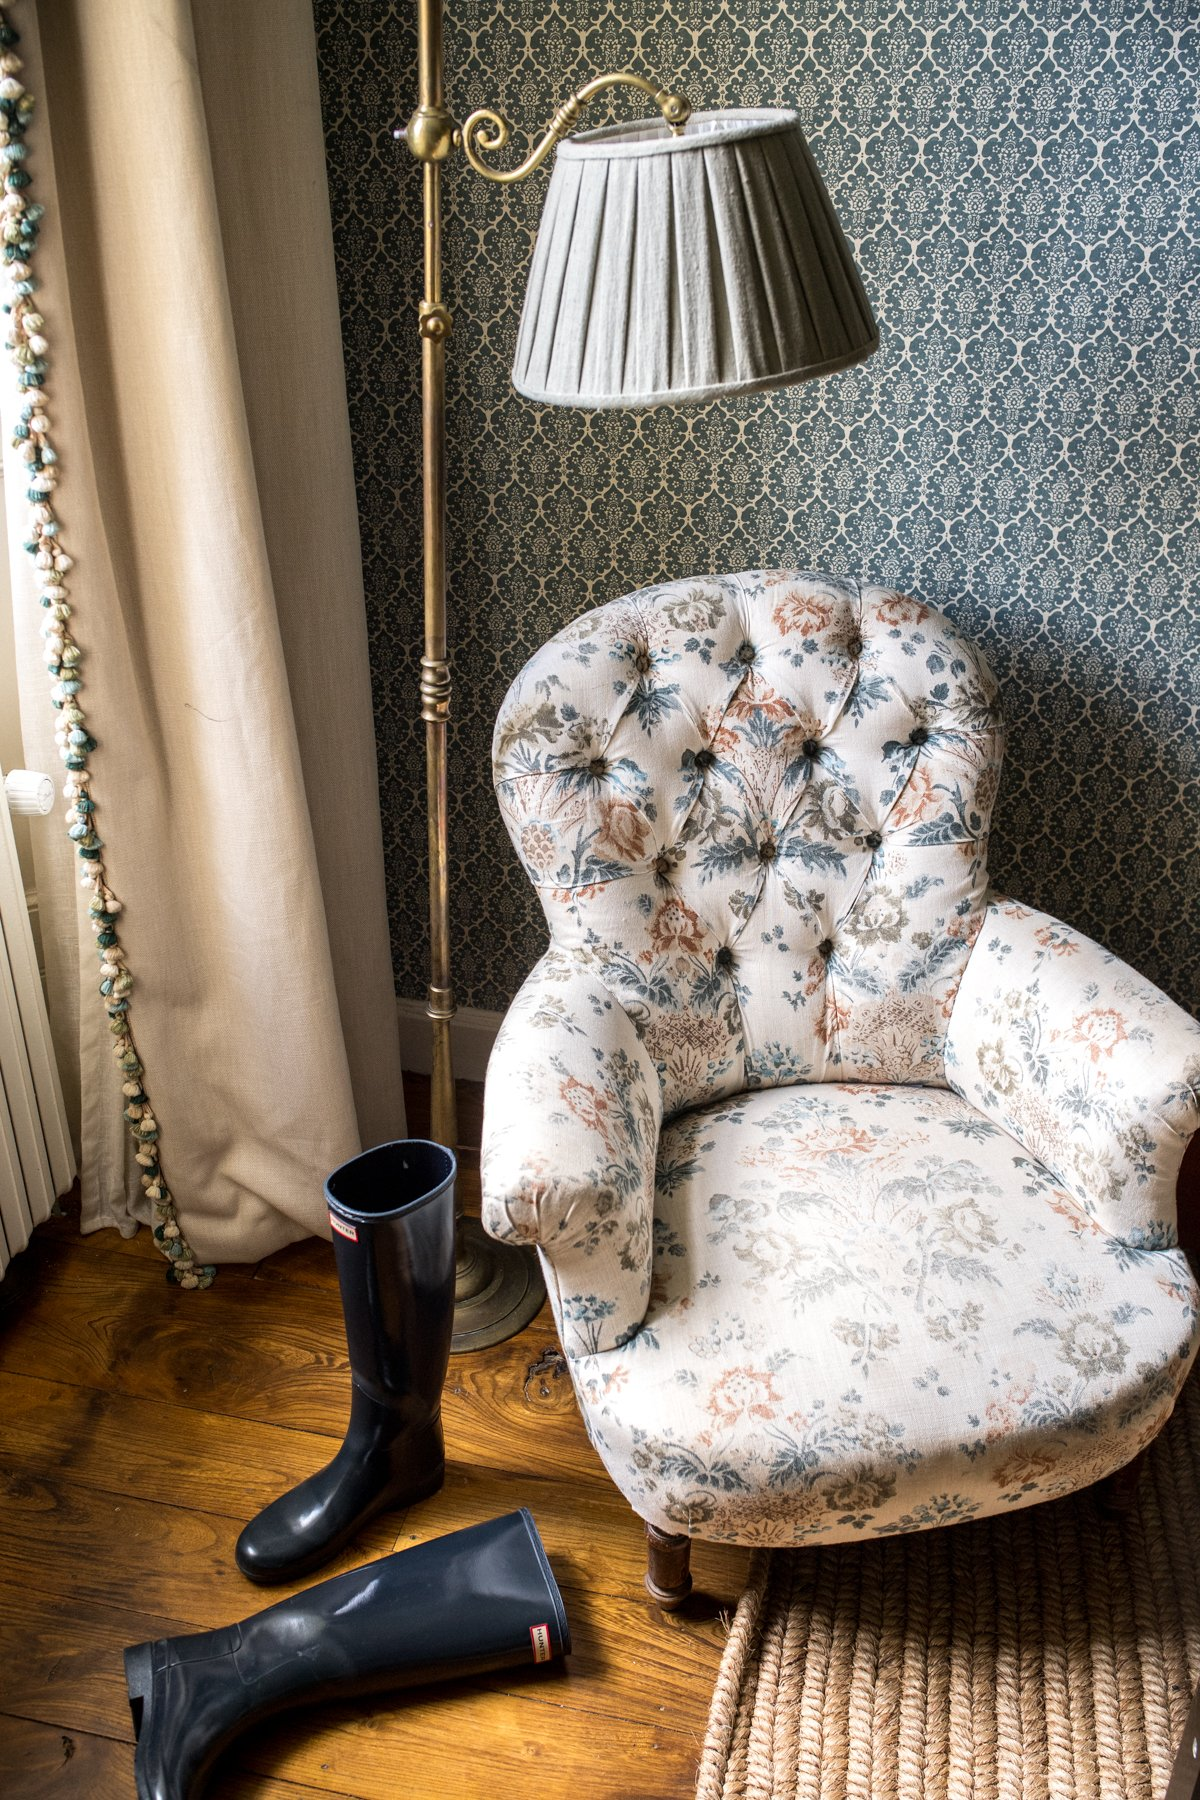 Stacie Flinner Soho House Babington House England-17.jpg